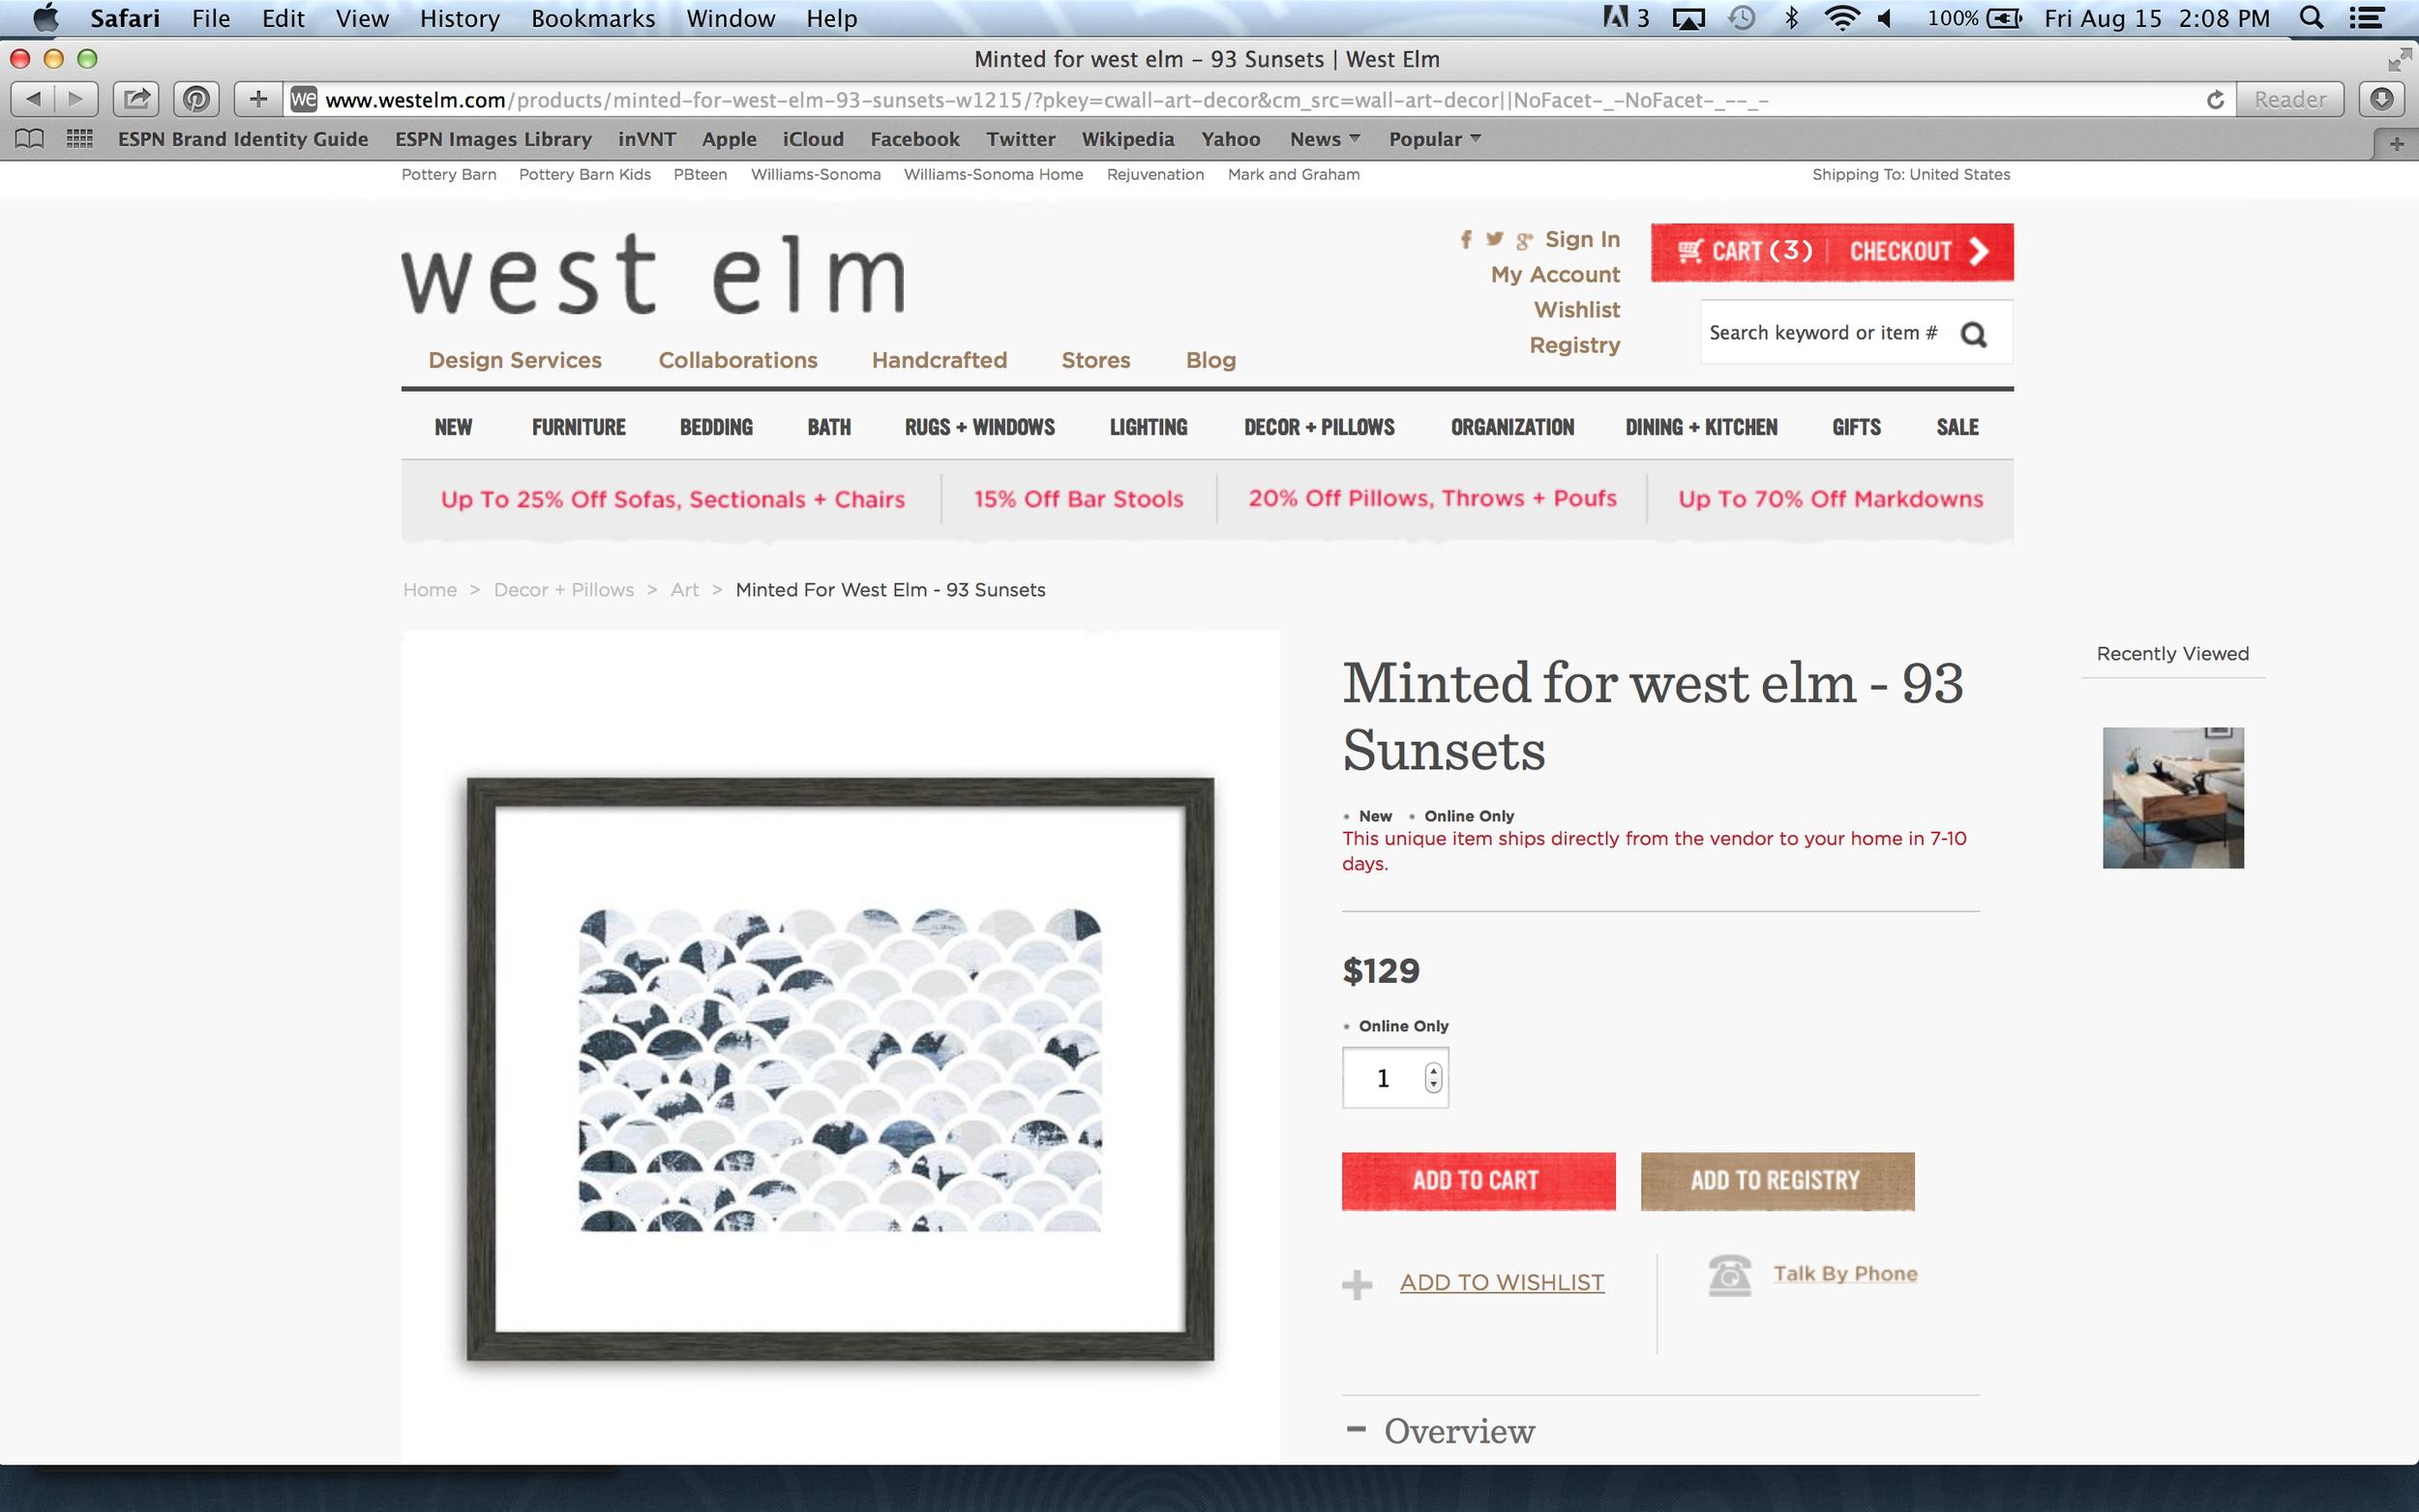 Award Winner - Art Print available at West Elm